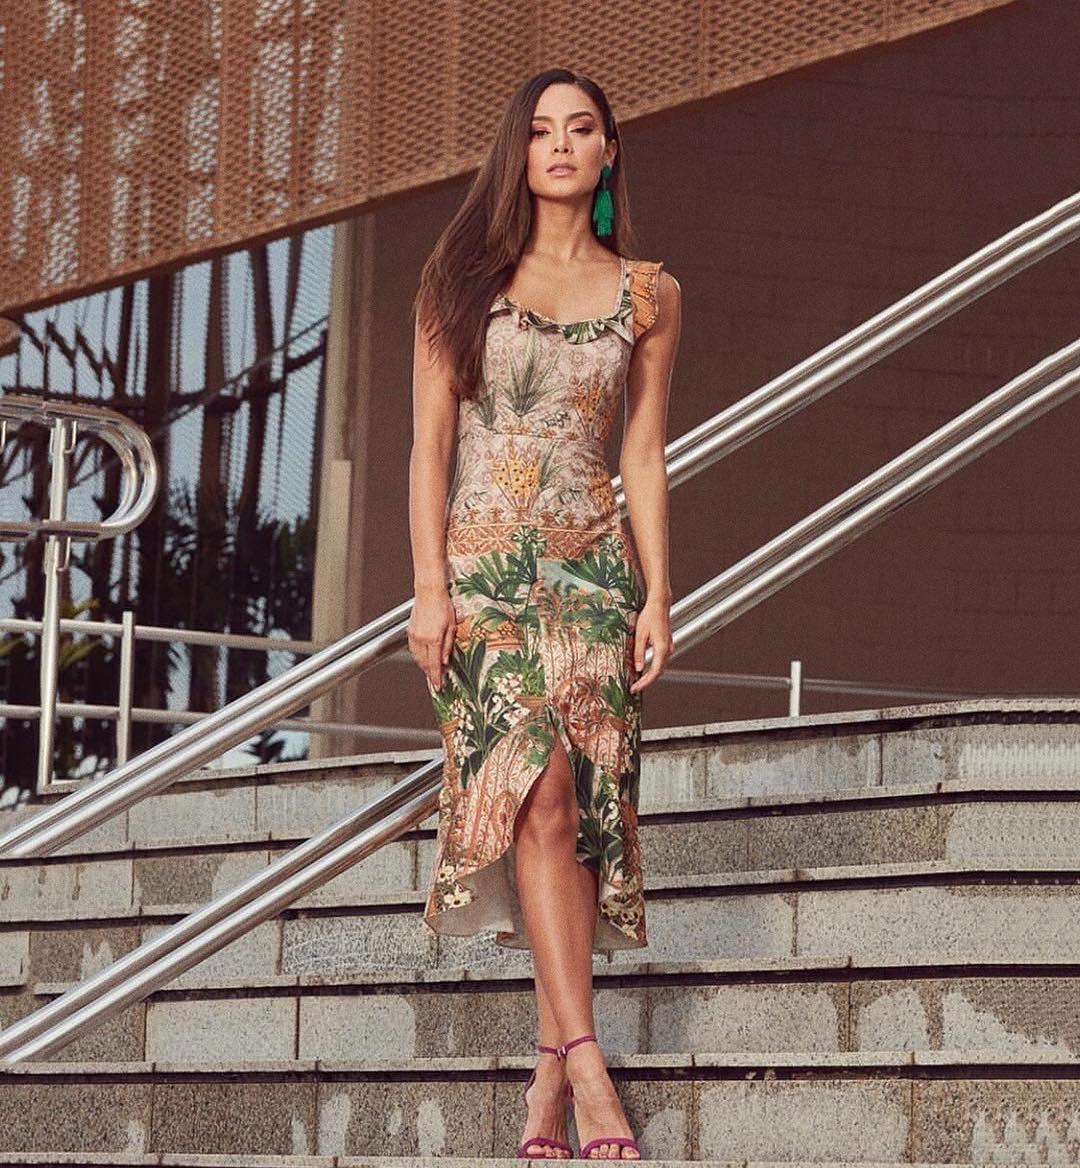 luana lobo, top 2 de miss brasil 2019. - Página 17 54512110